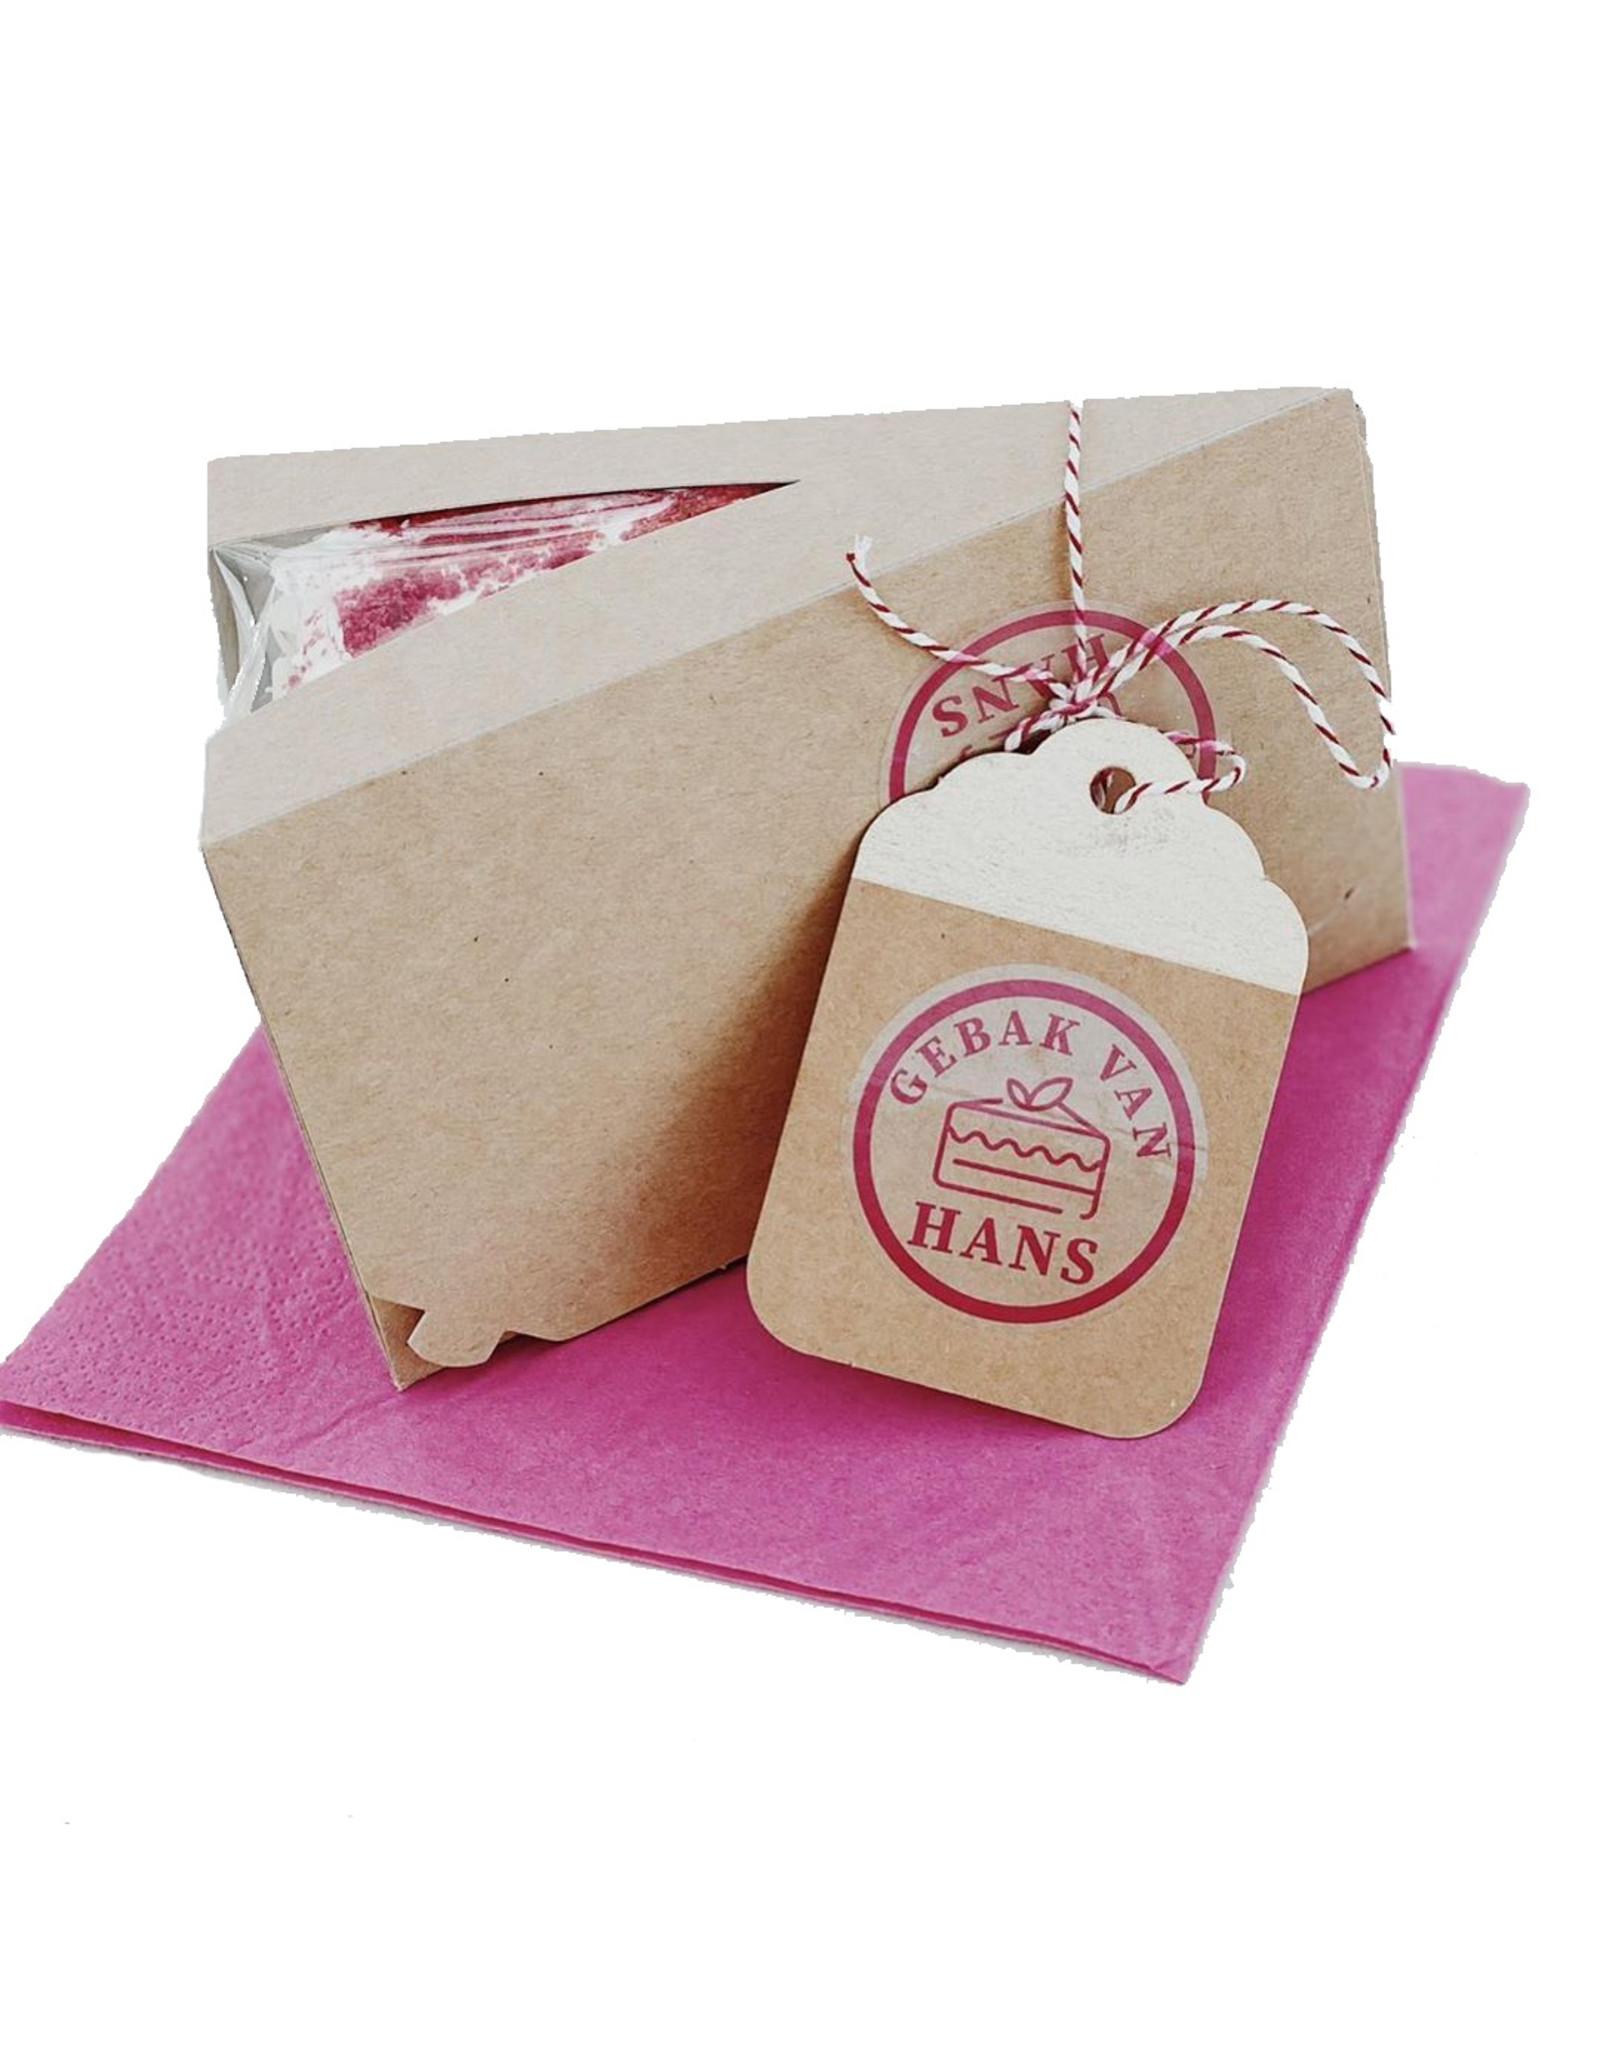 Kraft cake slice box (per 50 pieces)